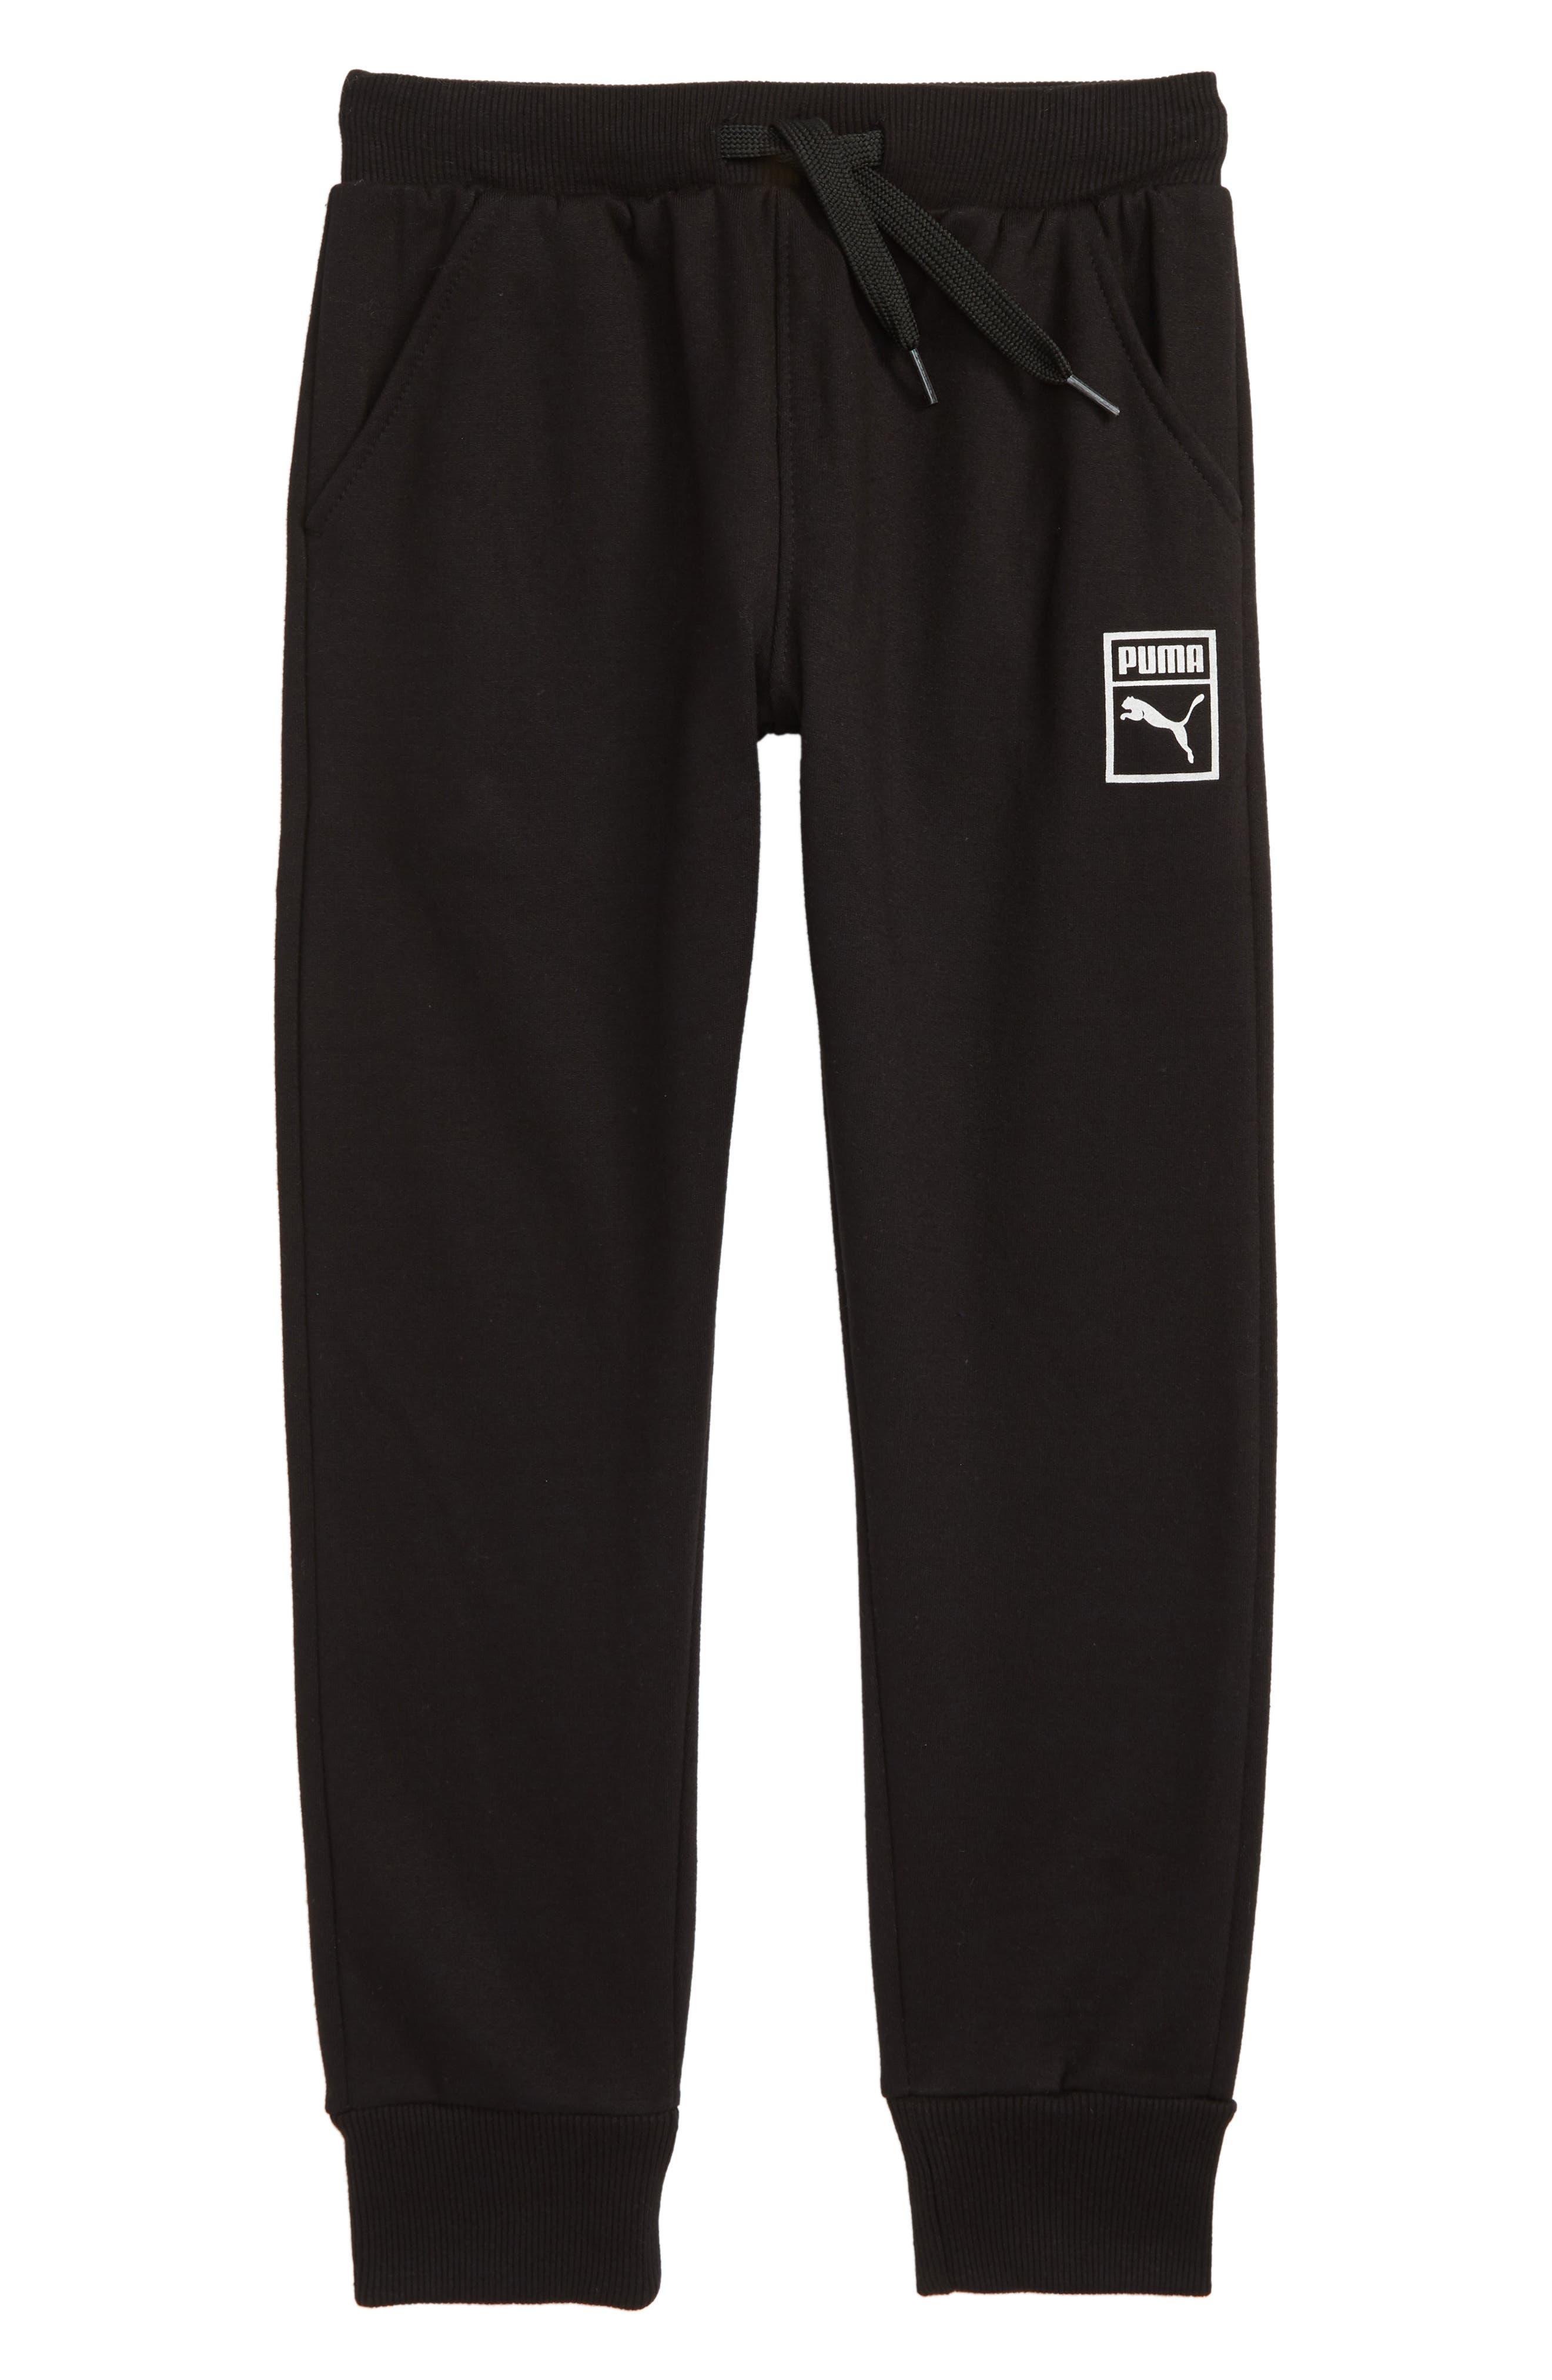 PUMA Fleece Jogger Pants, Main, color, 001